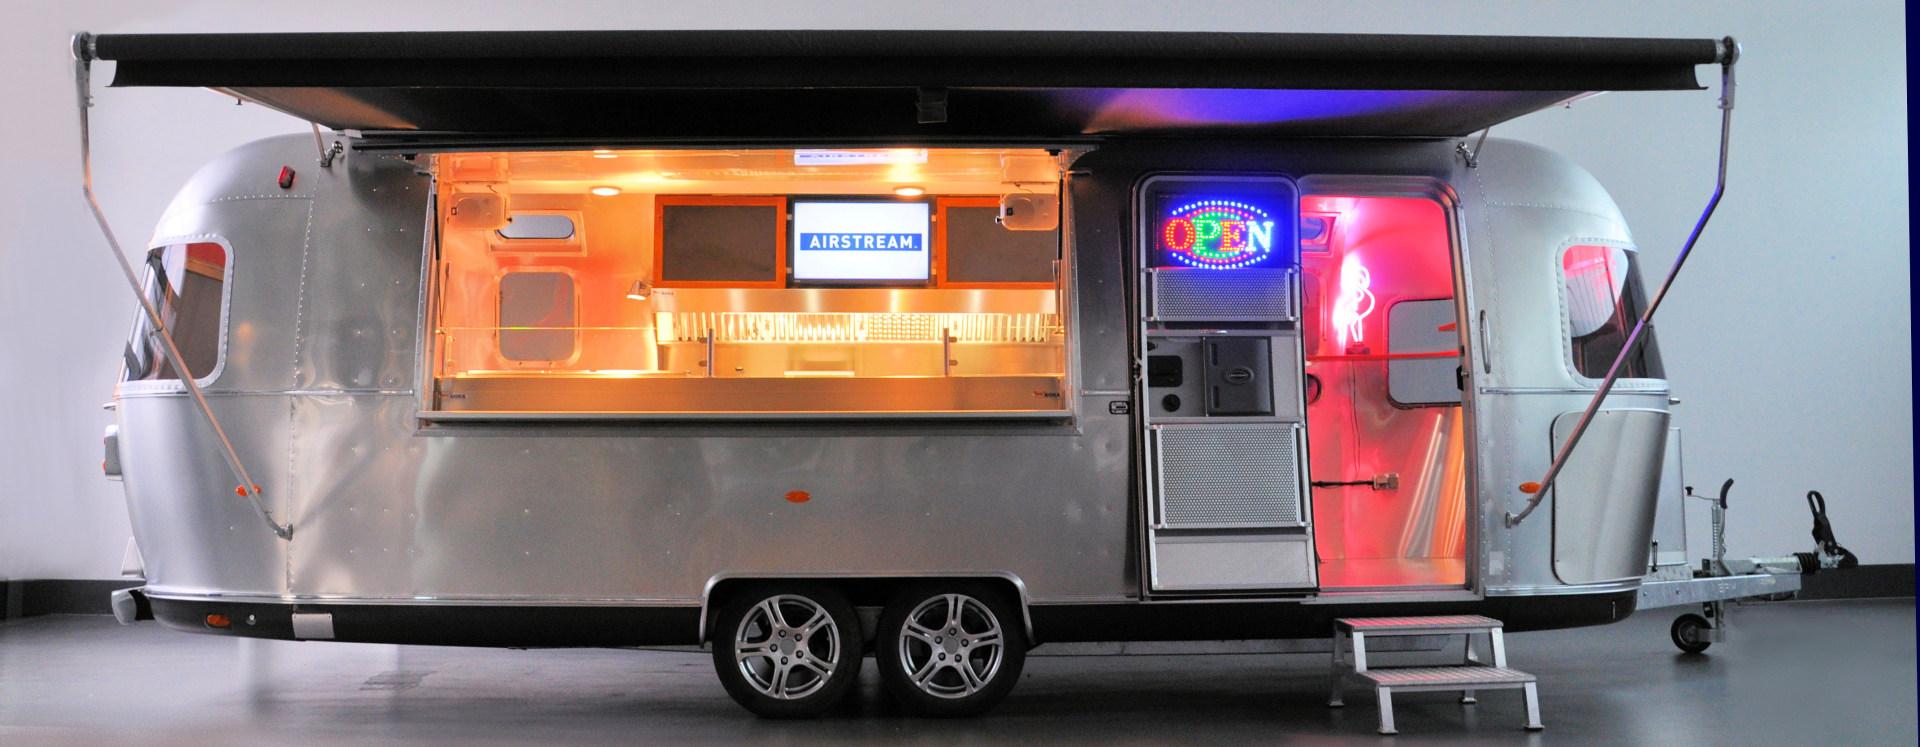 Airstream Diner XL - Airstream Profiküche auf 17 Quadratmetern